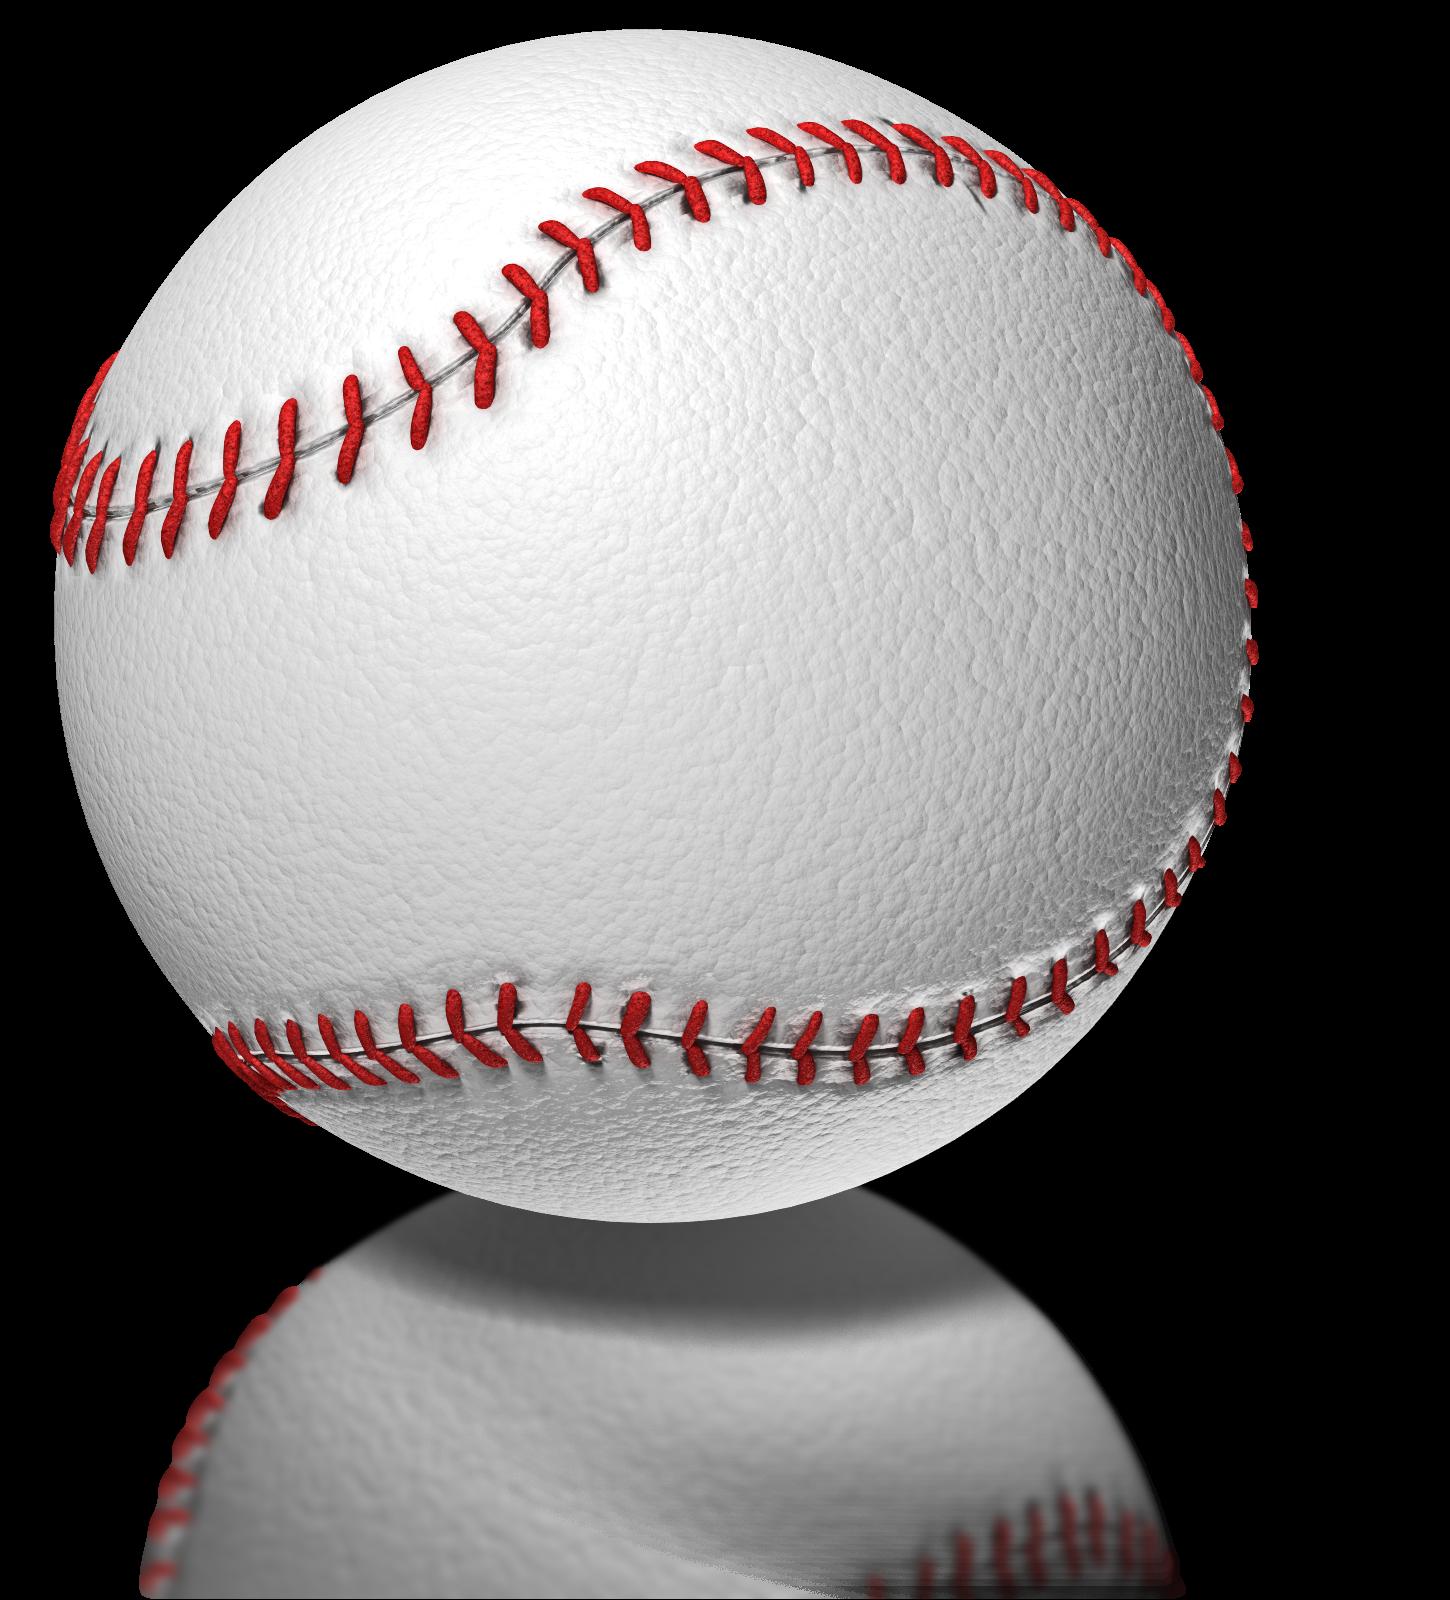 Baseball image transparent clipart #35355.